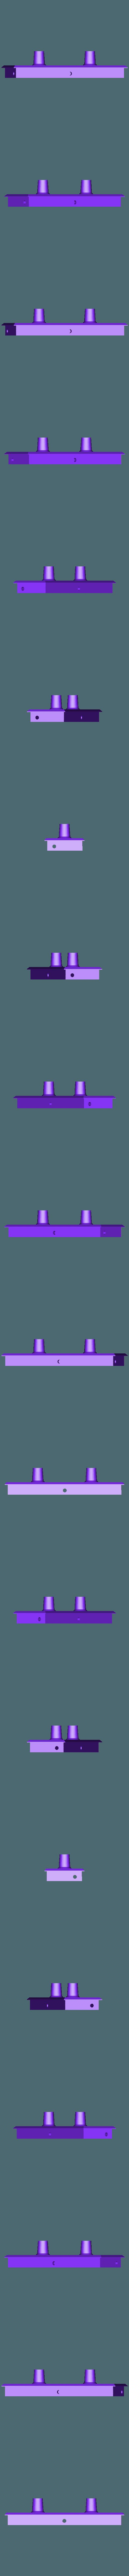 Fan_to_pipe_adapter.STL Download free STL file DIY Solder Fume extractor with variable power • 3D printable model, ellisdrake21